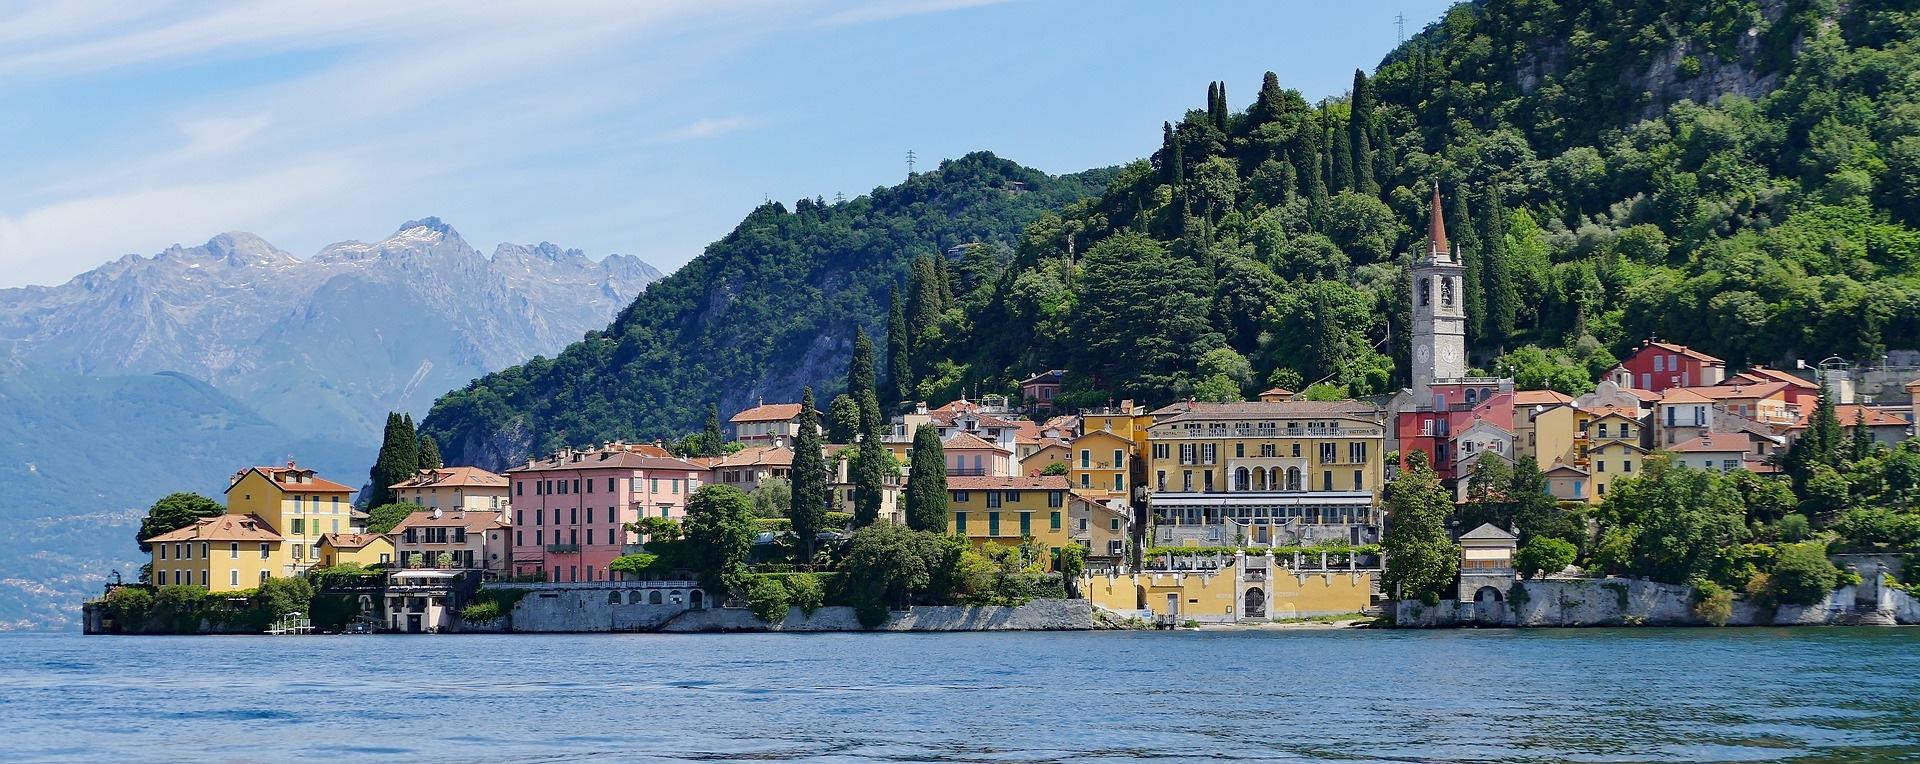 Lake Como, Italy honeymoon road trips in europe